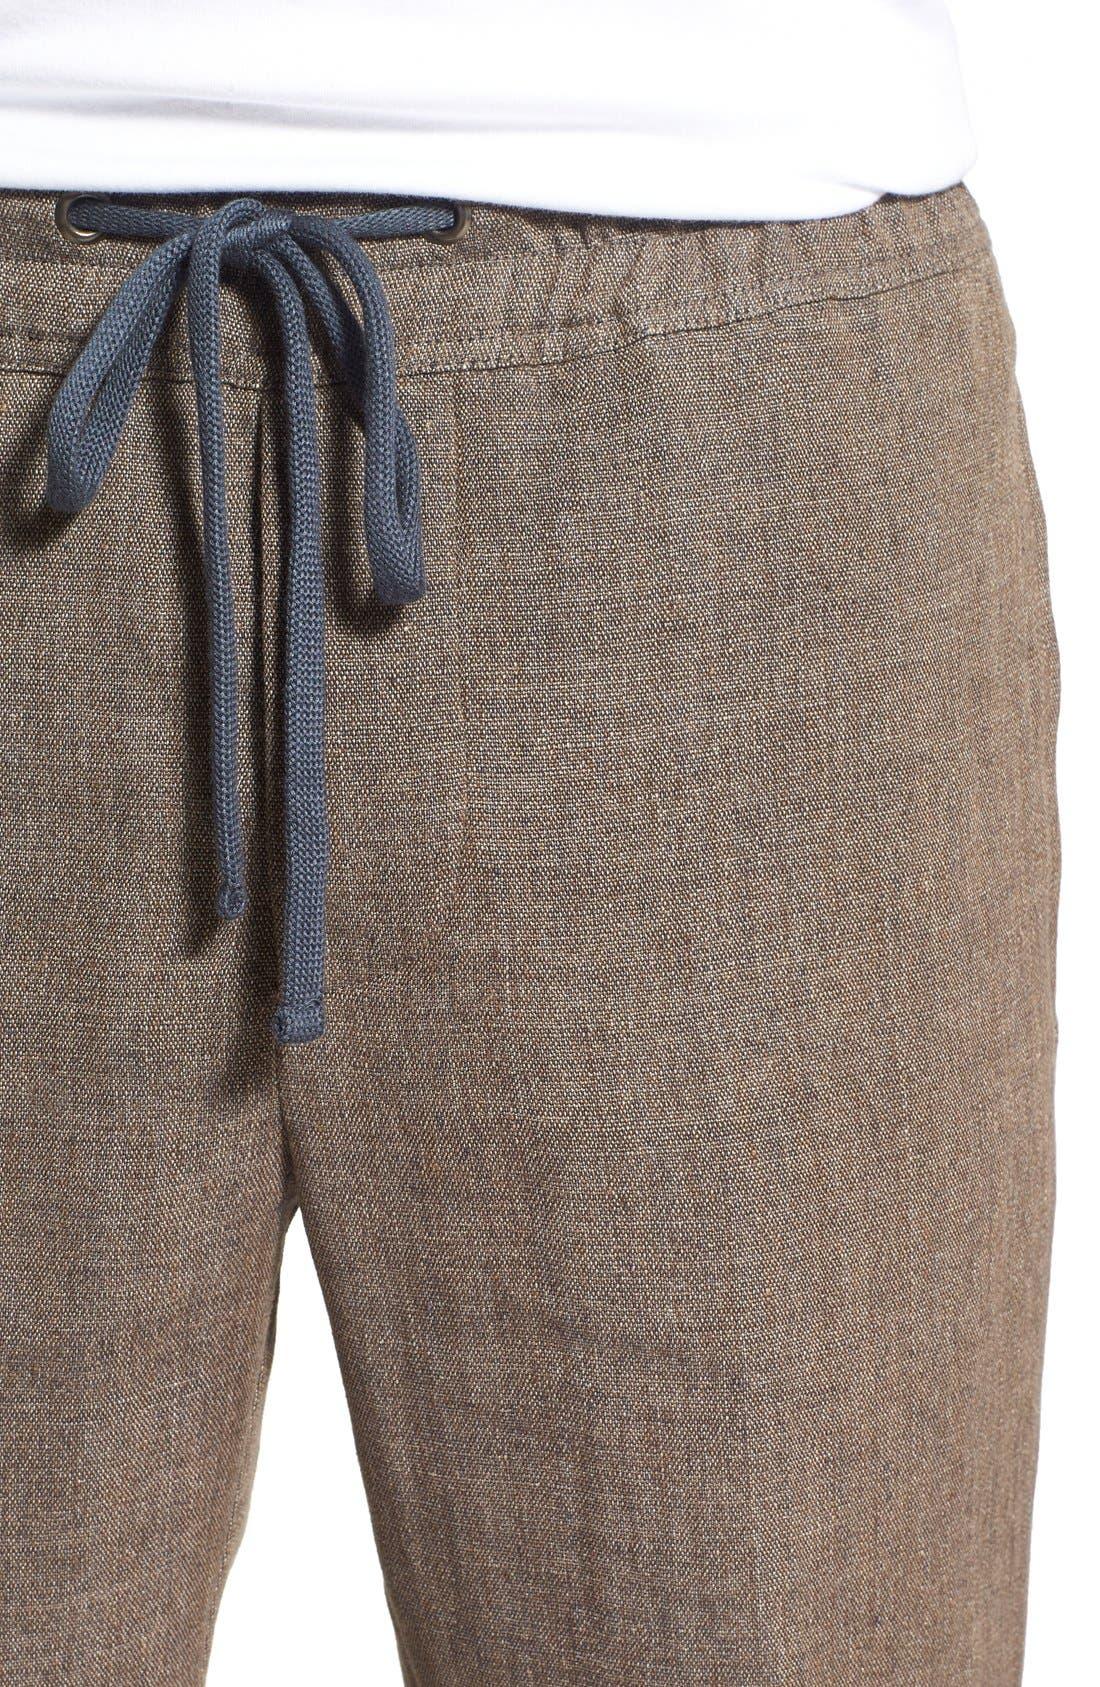 'Delave' Drawstring Linen Pants,                             Alternate thumbnail 4, color,                             207